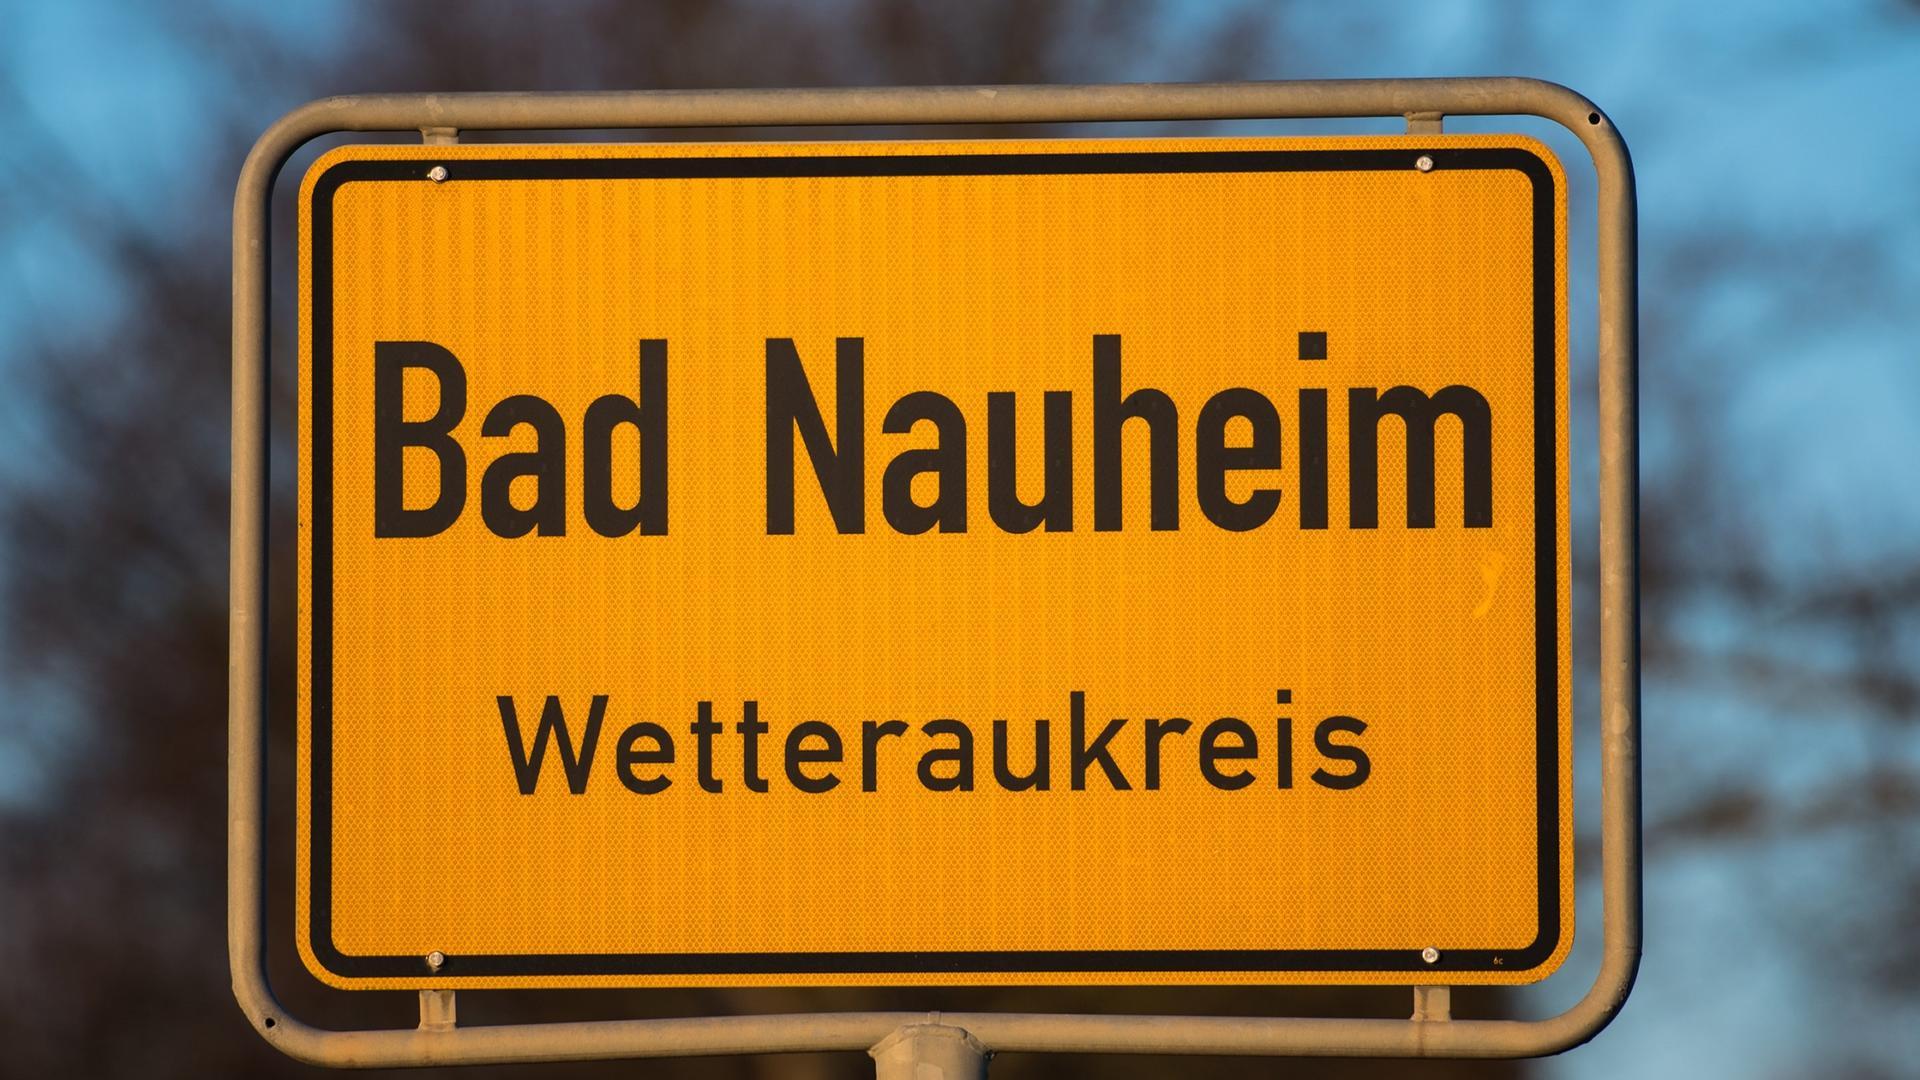 Deutschlands Wärmster Ort Bad Nauheim In Hessen Zdfmediathek